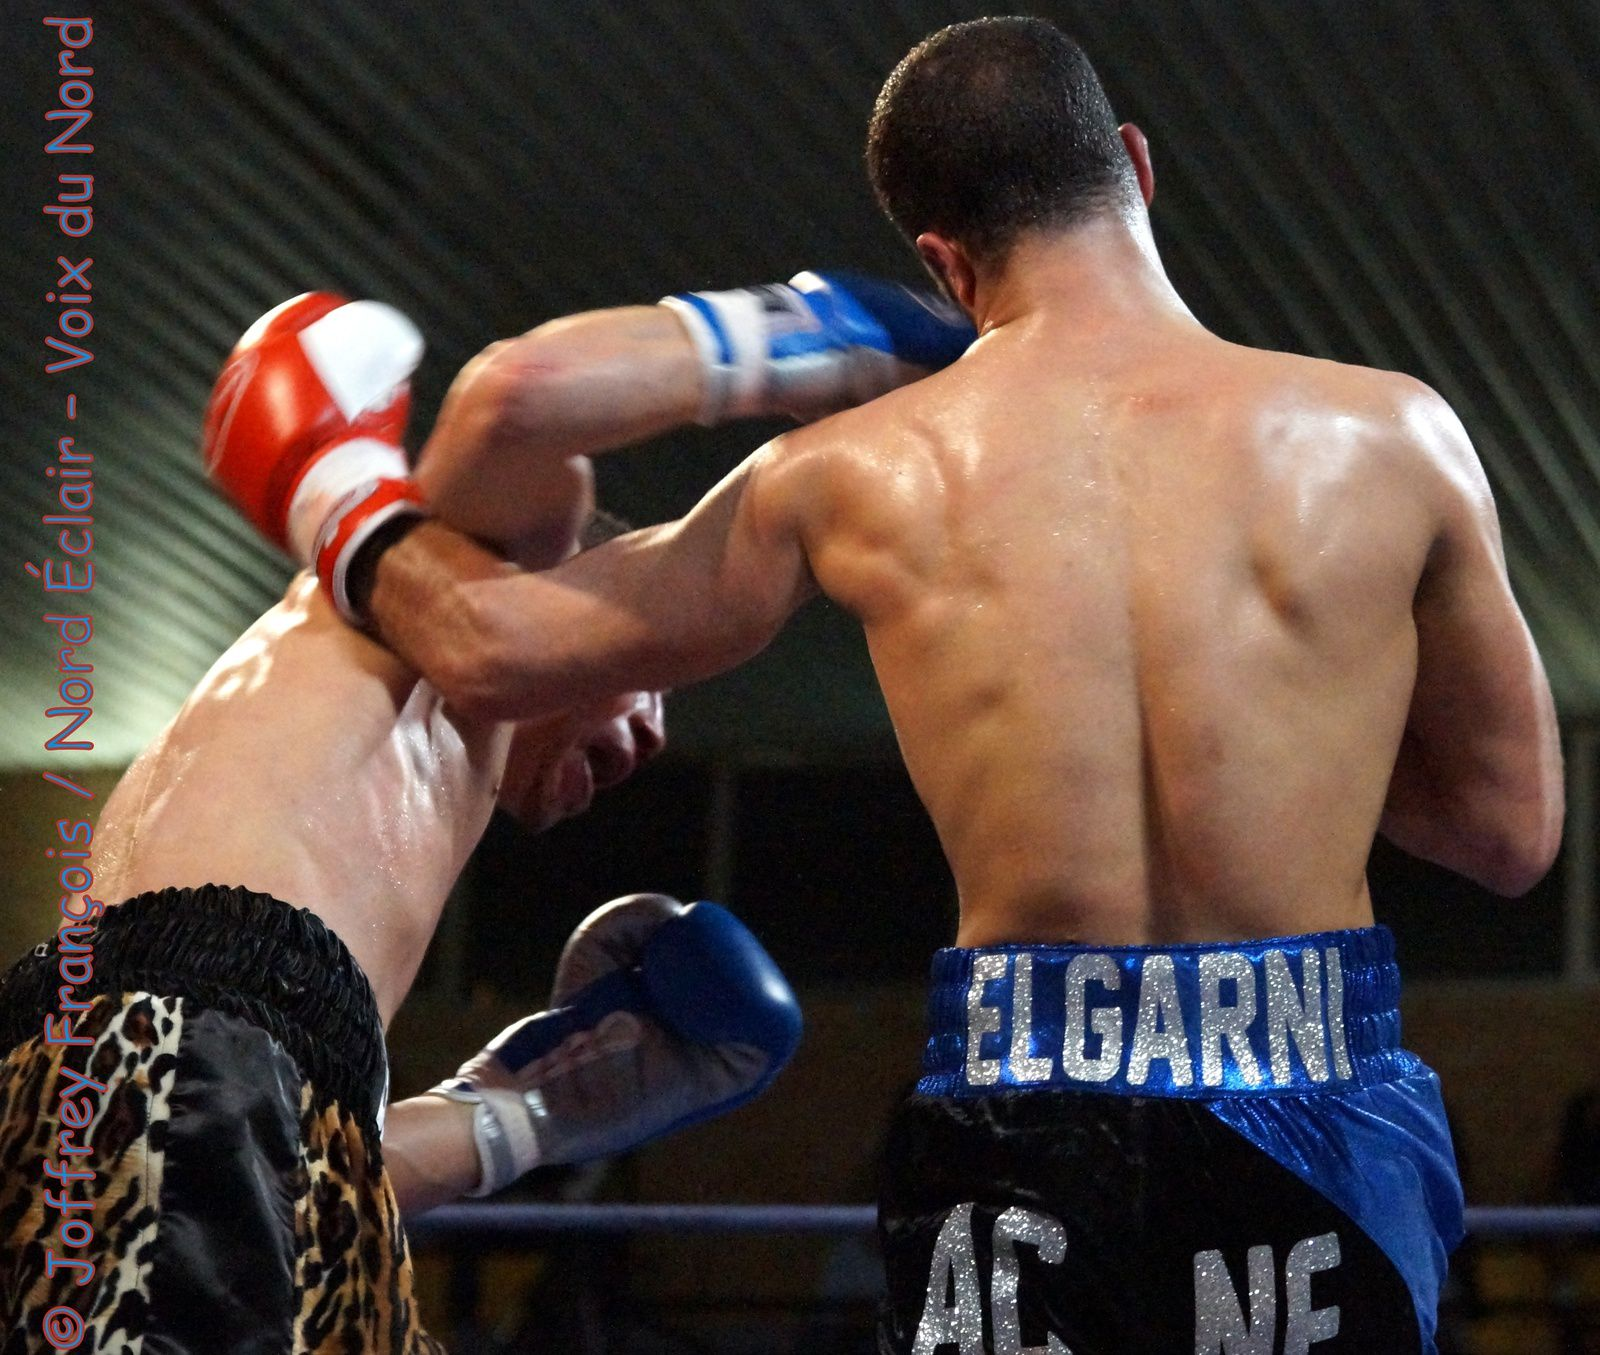 19.04.14 Boxe ElGarni-Boufagua